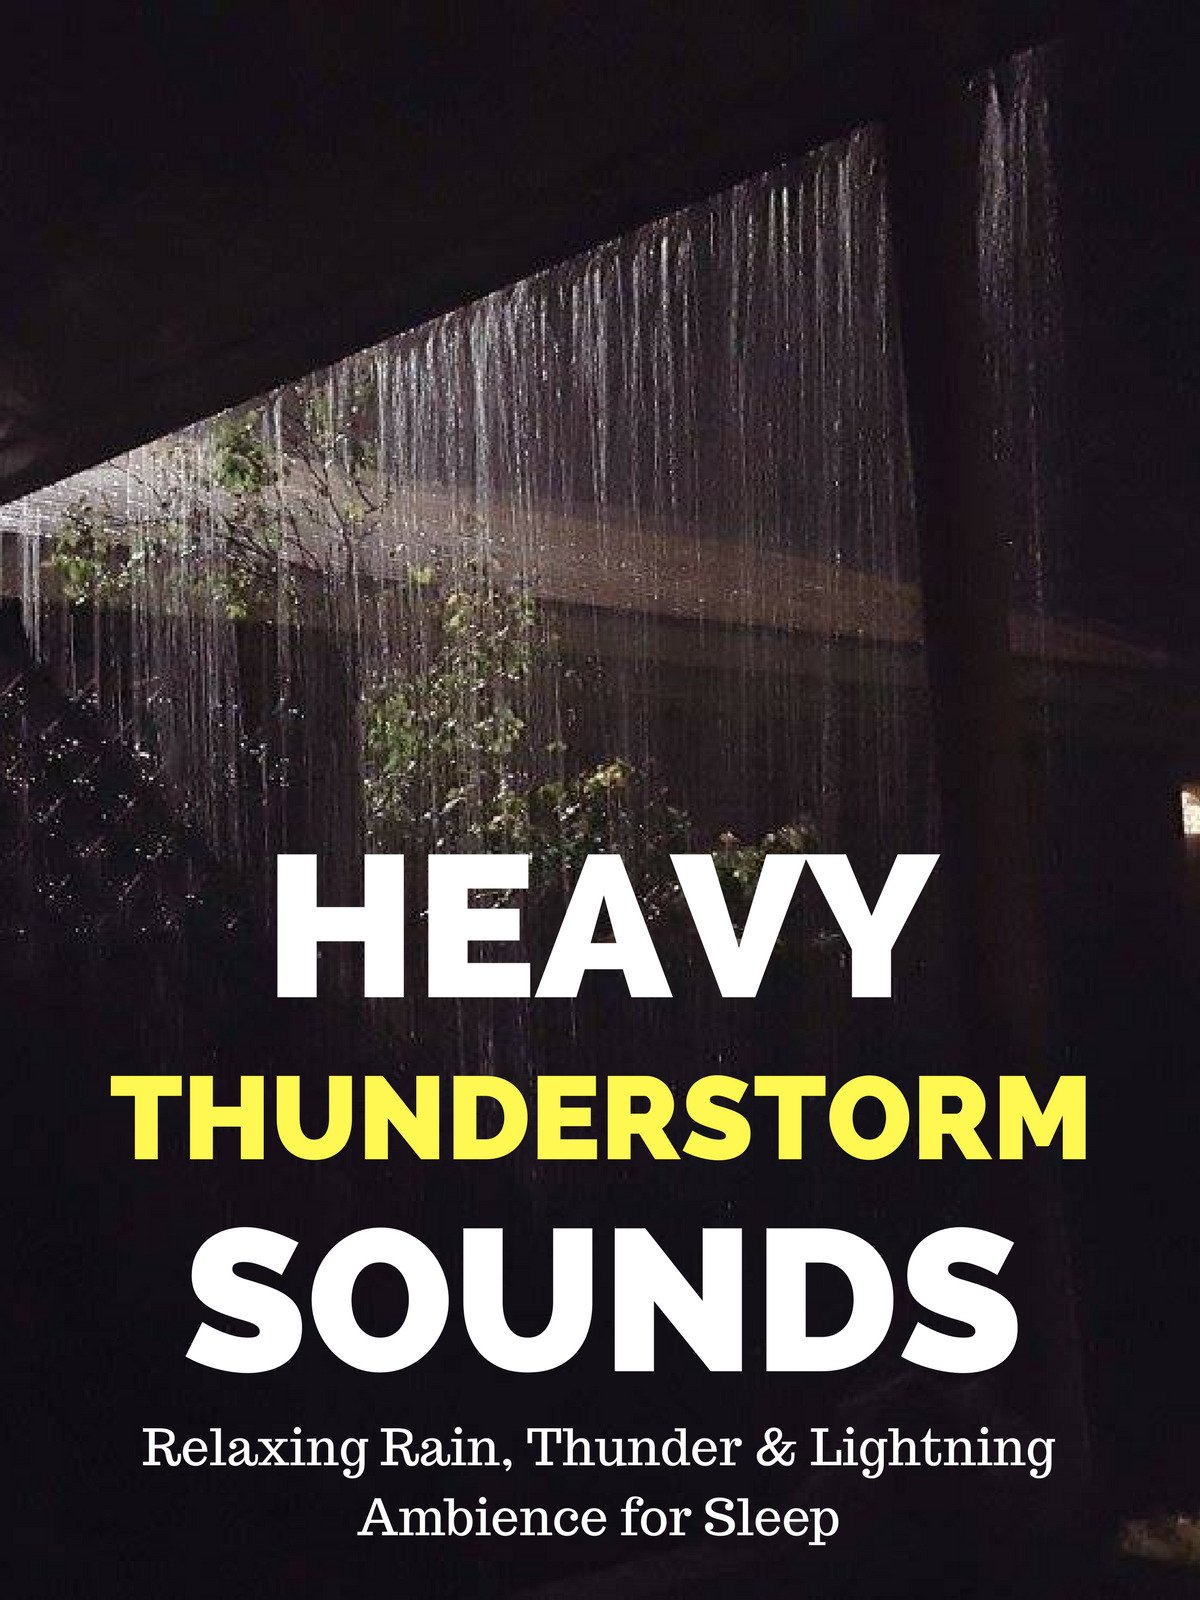 Heavy Thunderstorm Sounds on Amazon Prime Instant Video UK